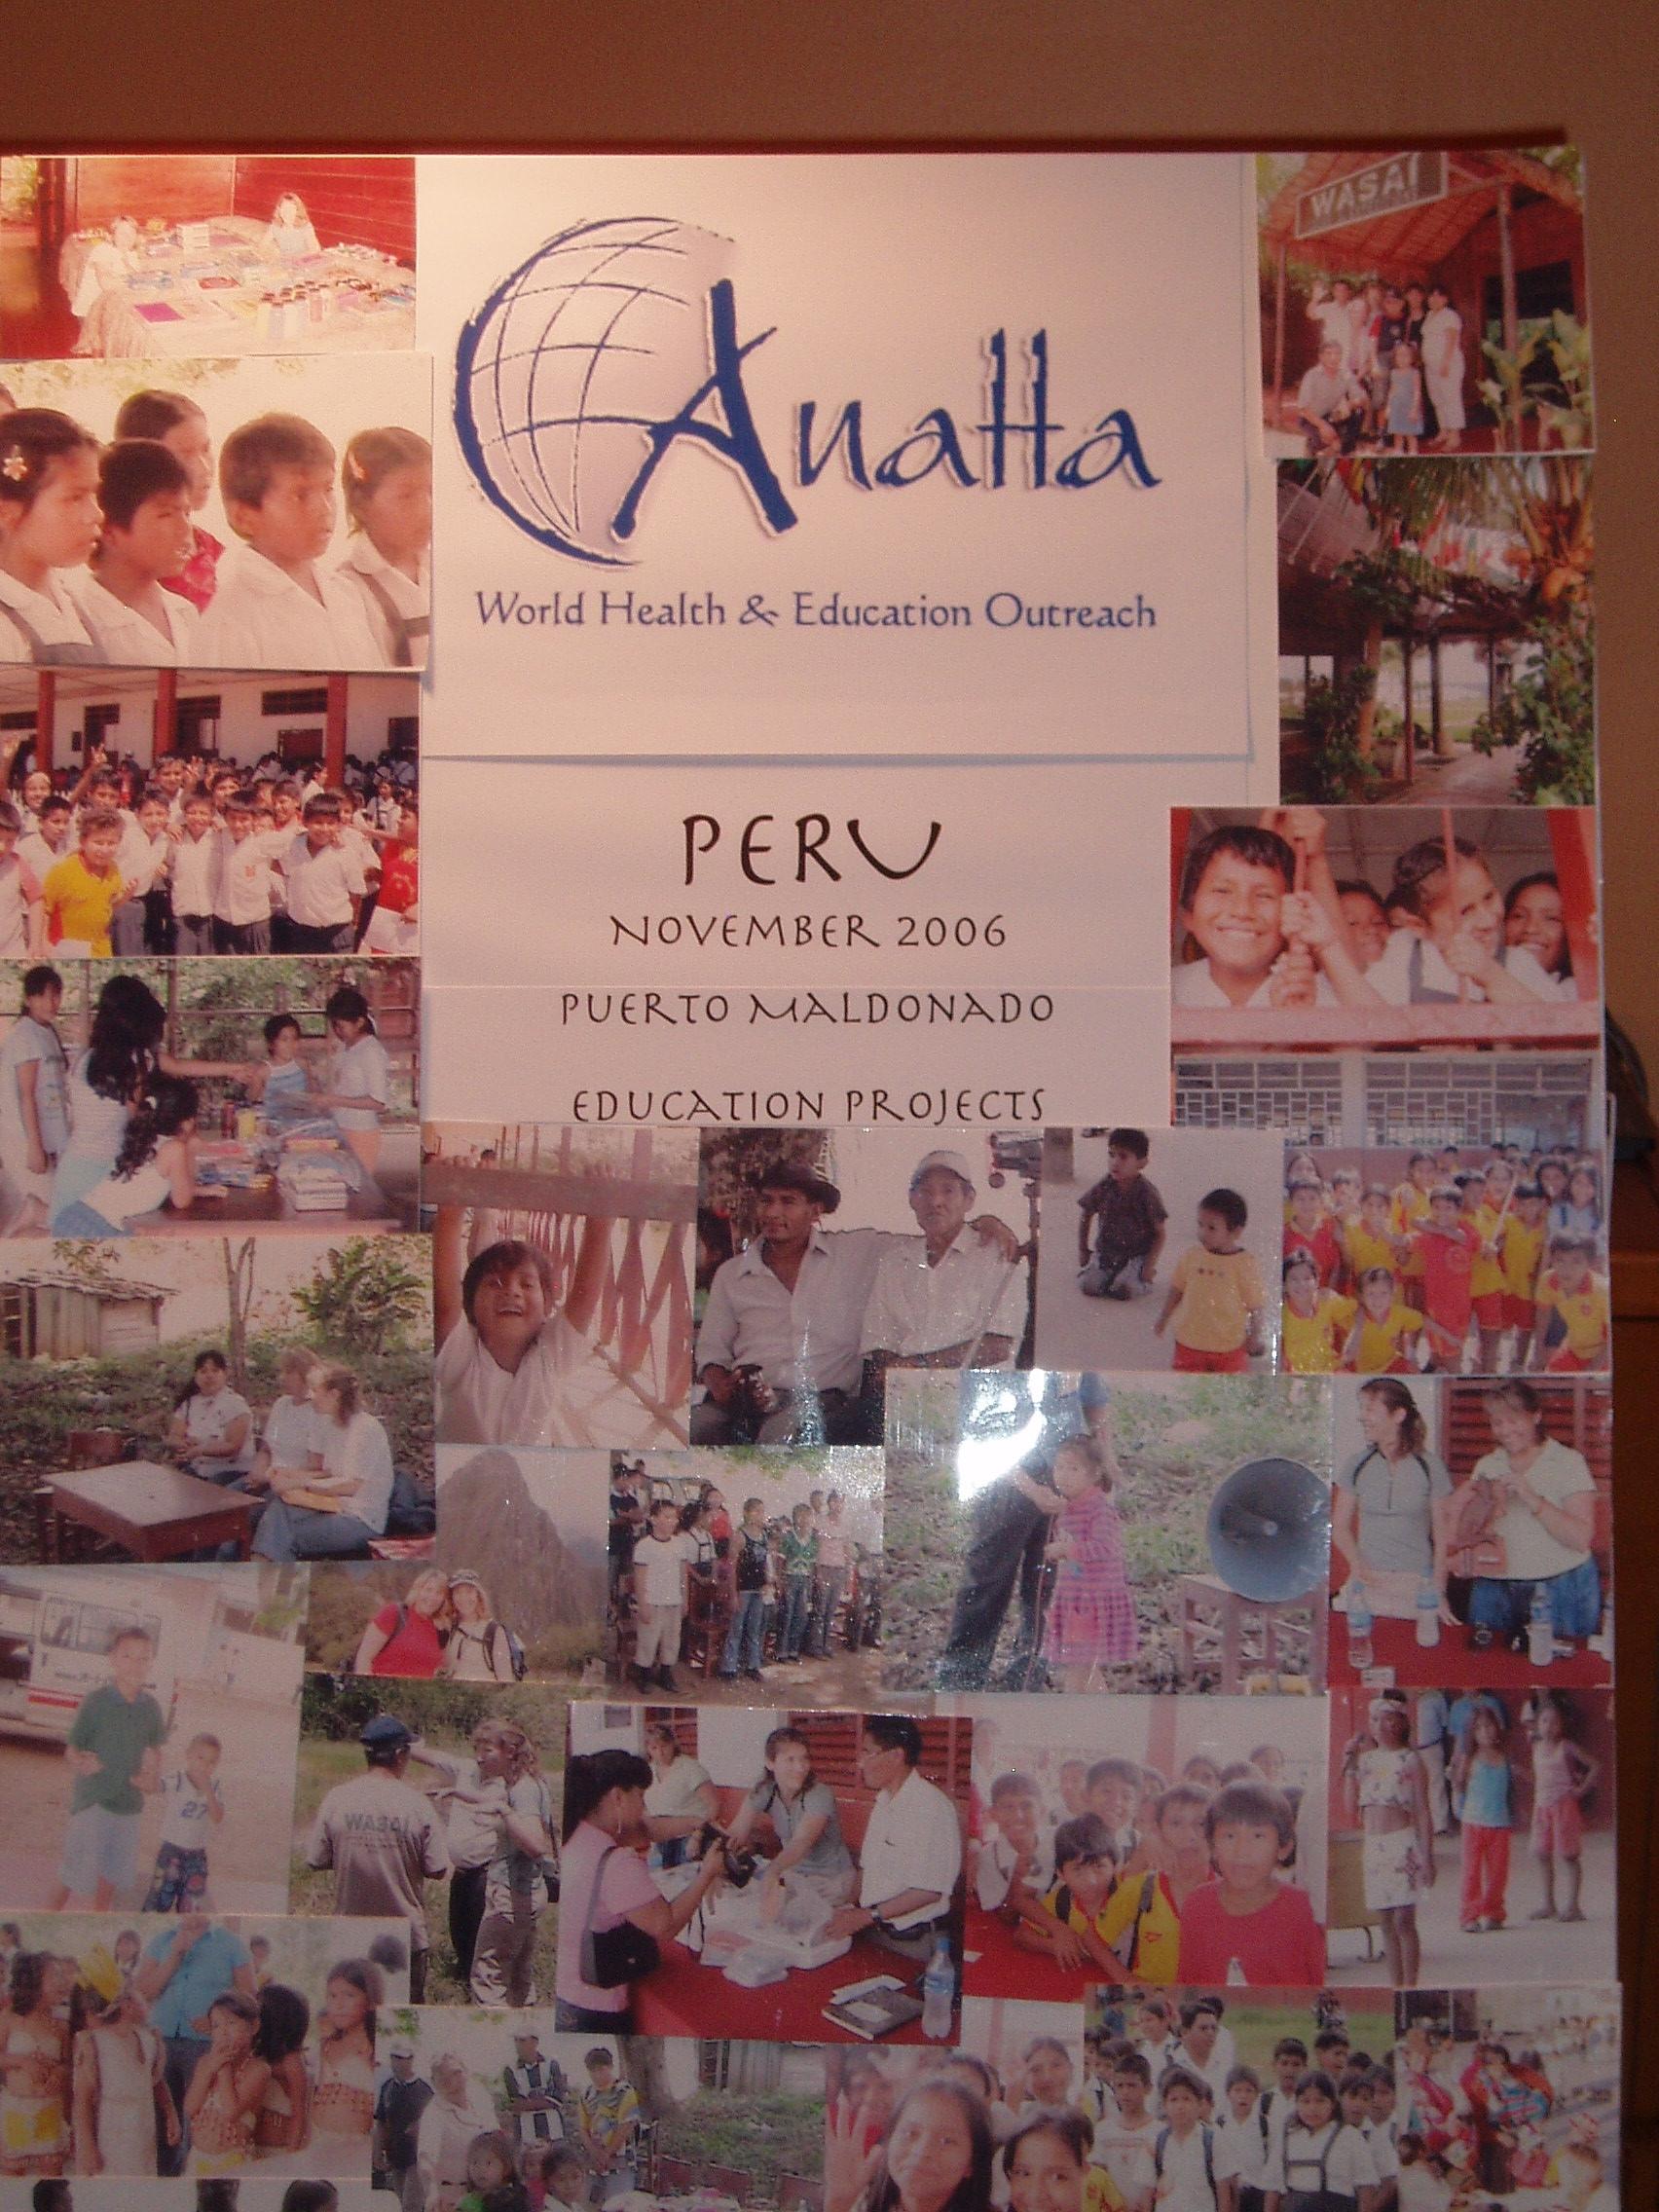 Peru Poster 9:07.jpg